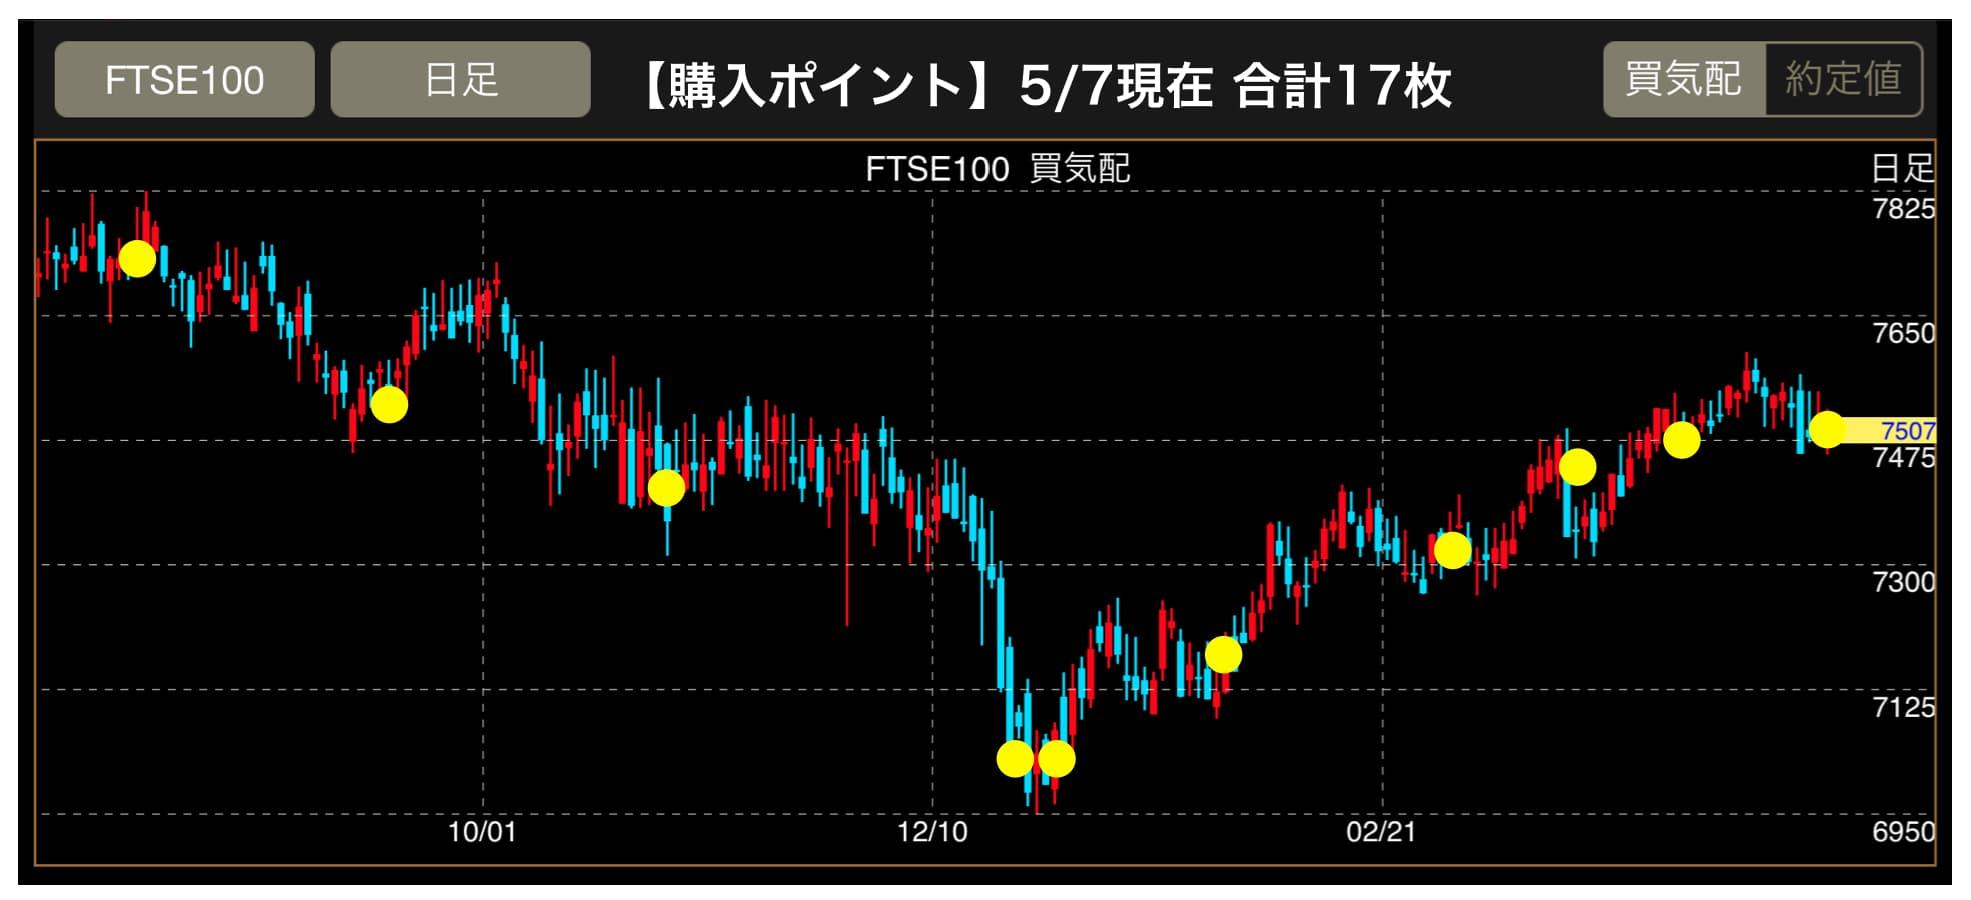 FTSE100のチャート